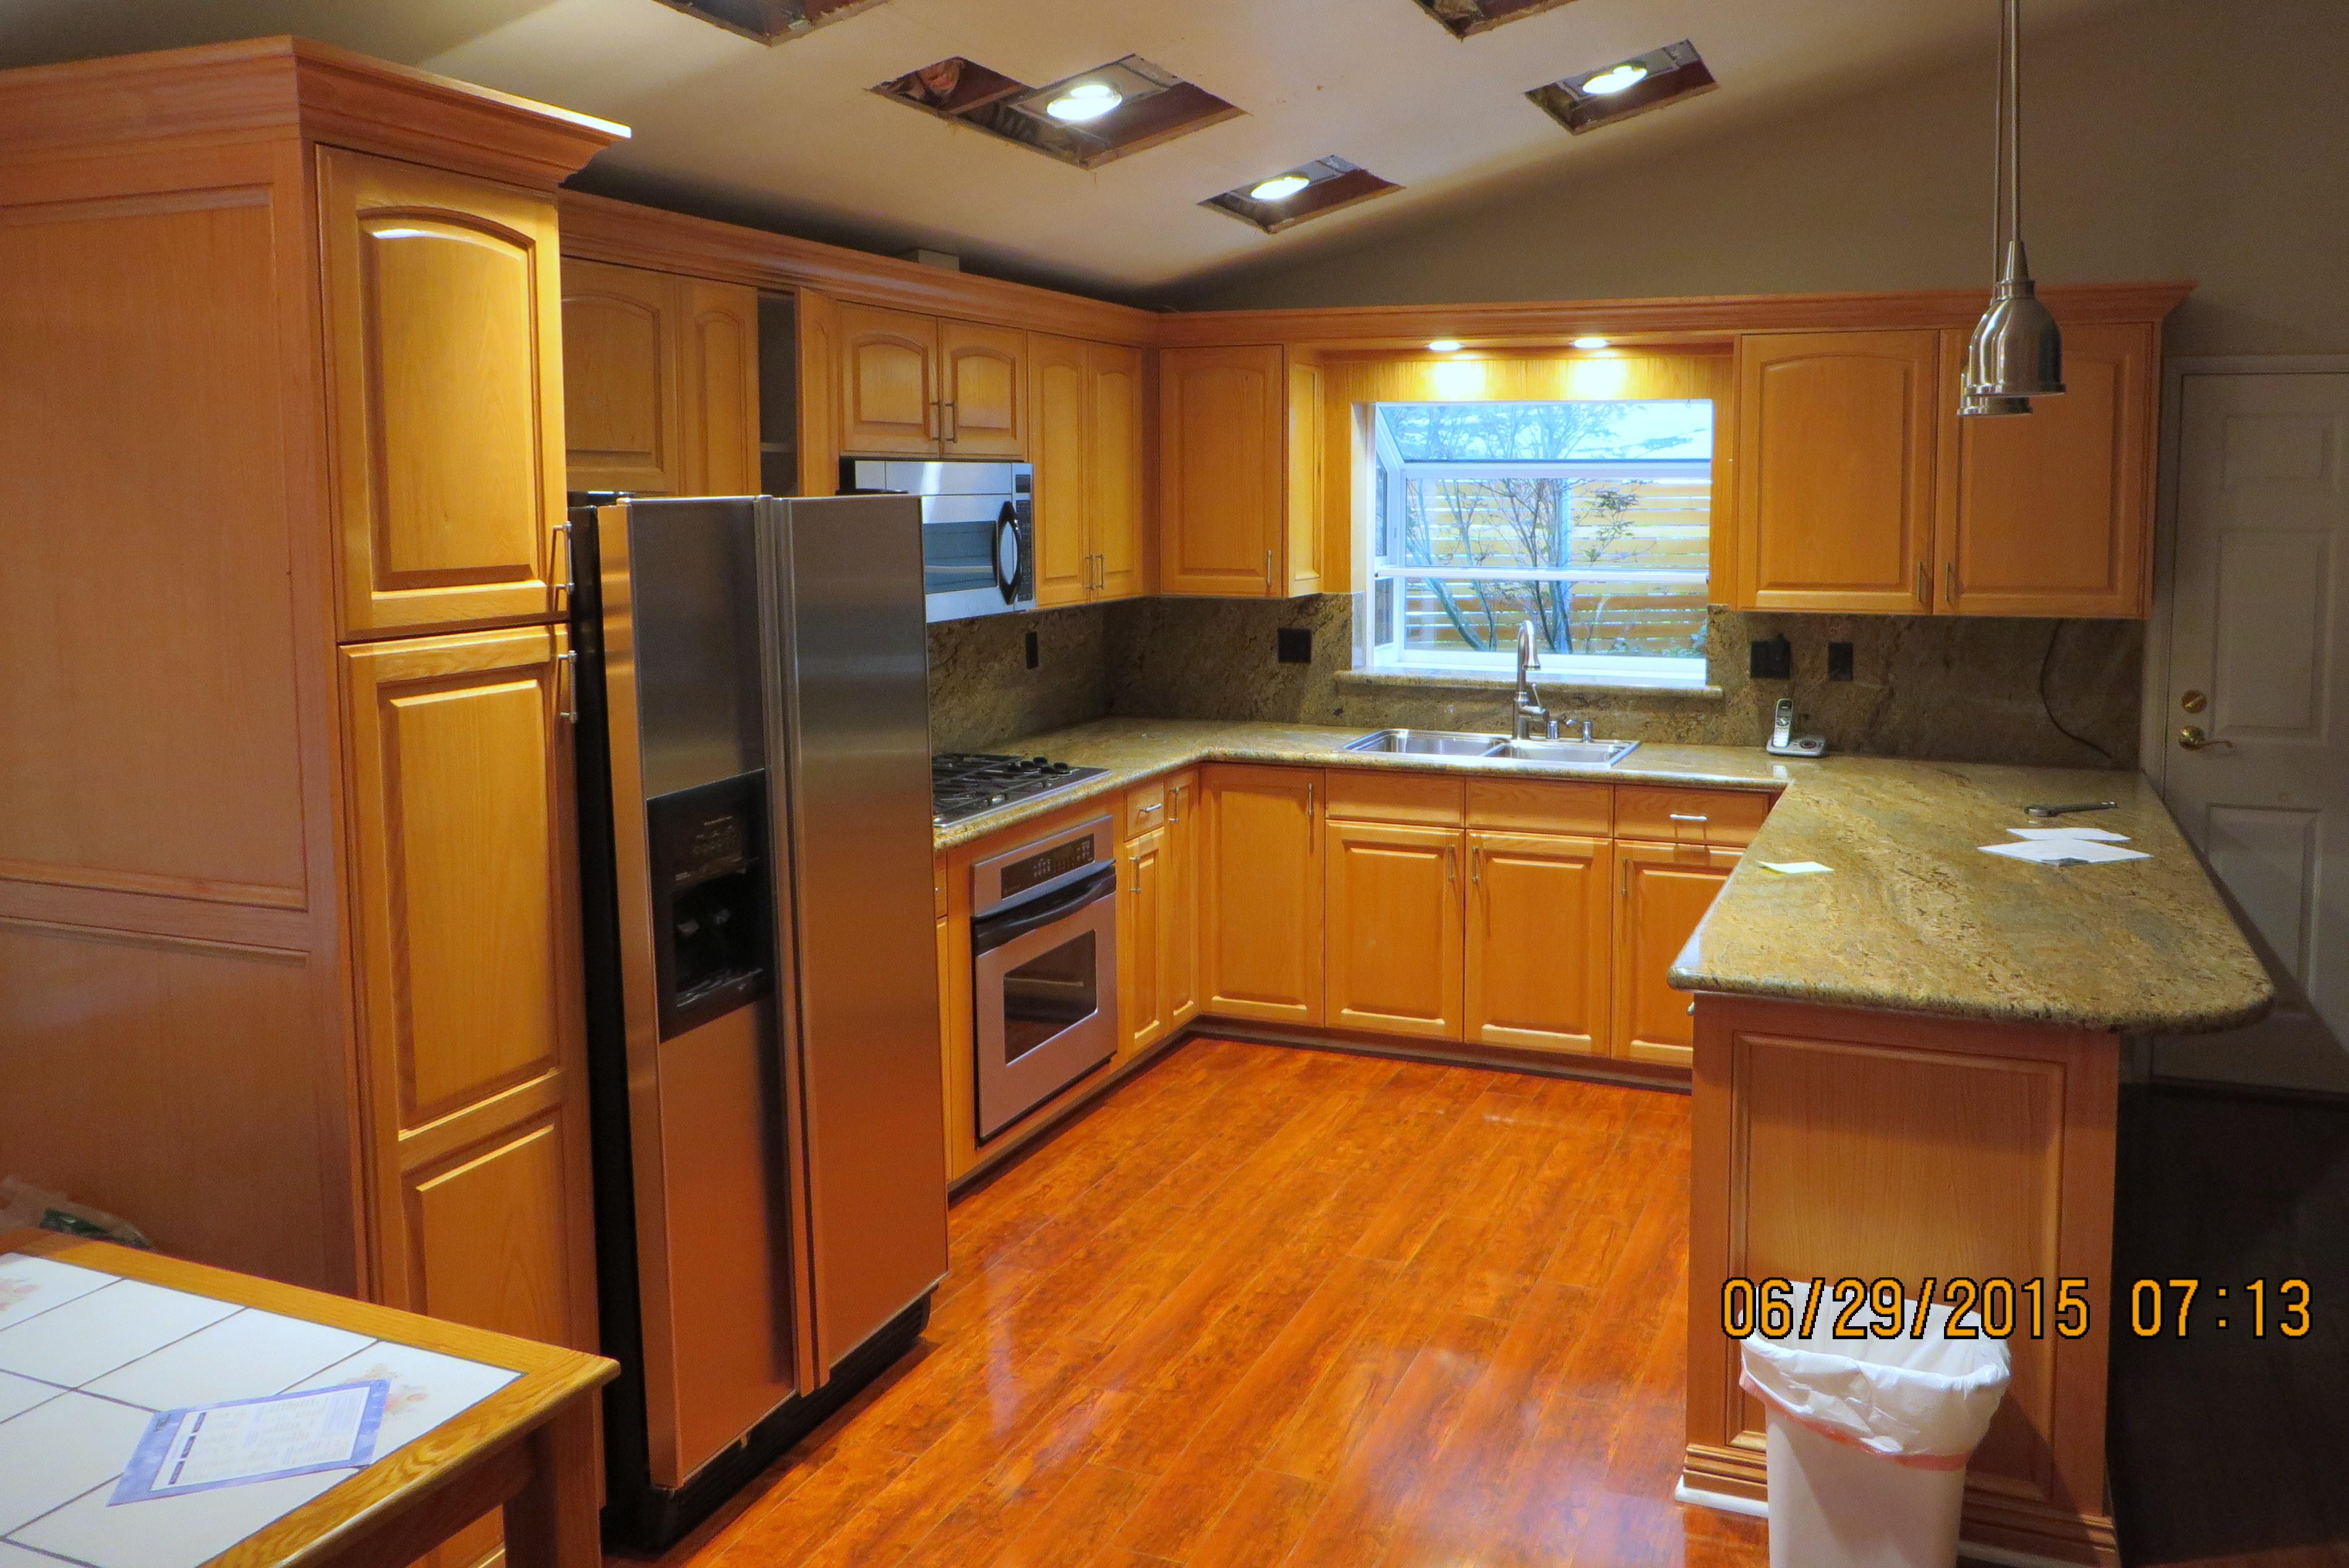 Interior Kitchen Cabinets - Woodland Hills, California